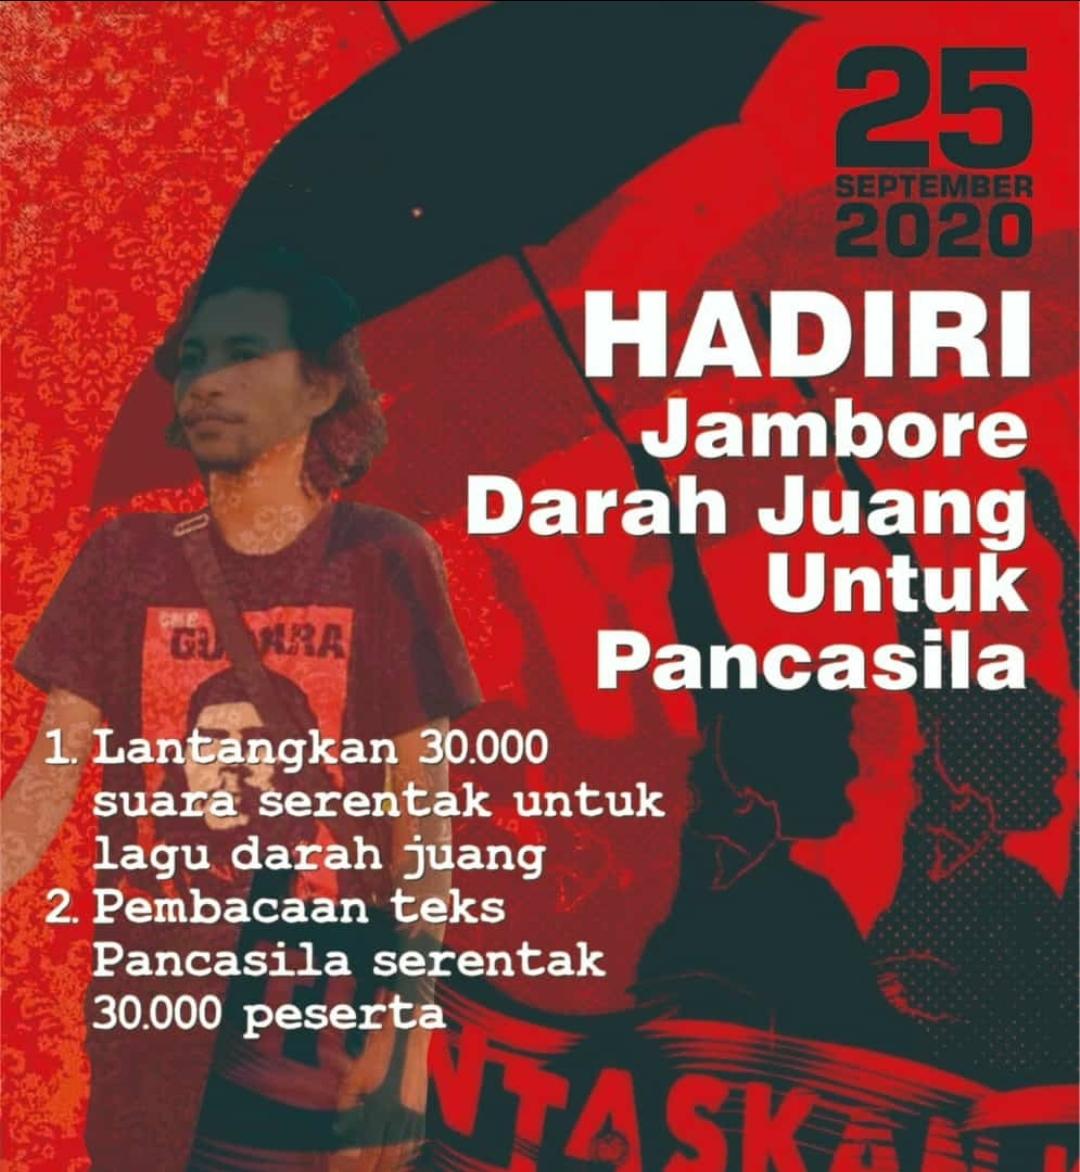 Digelar 25 September, Jambore Darah Juang Untuk Pancasila Bakal Dihadiri 30 Ribu Peserta